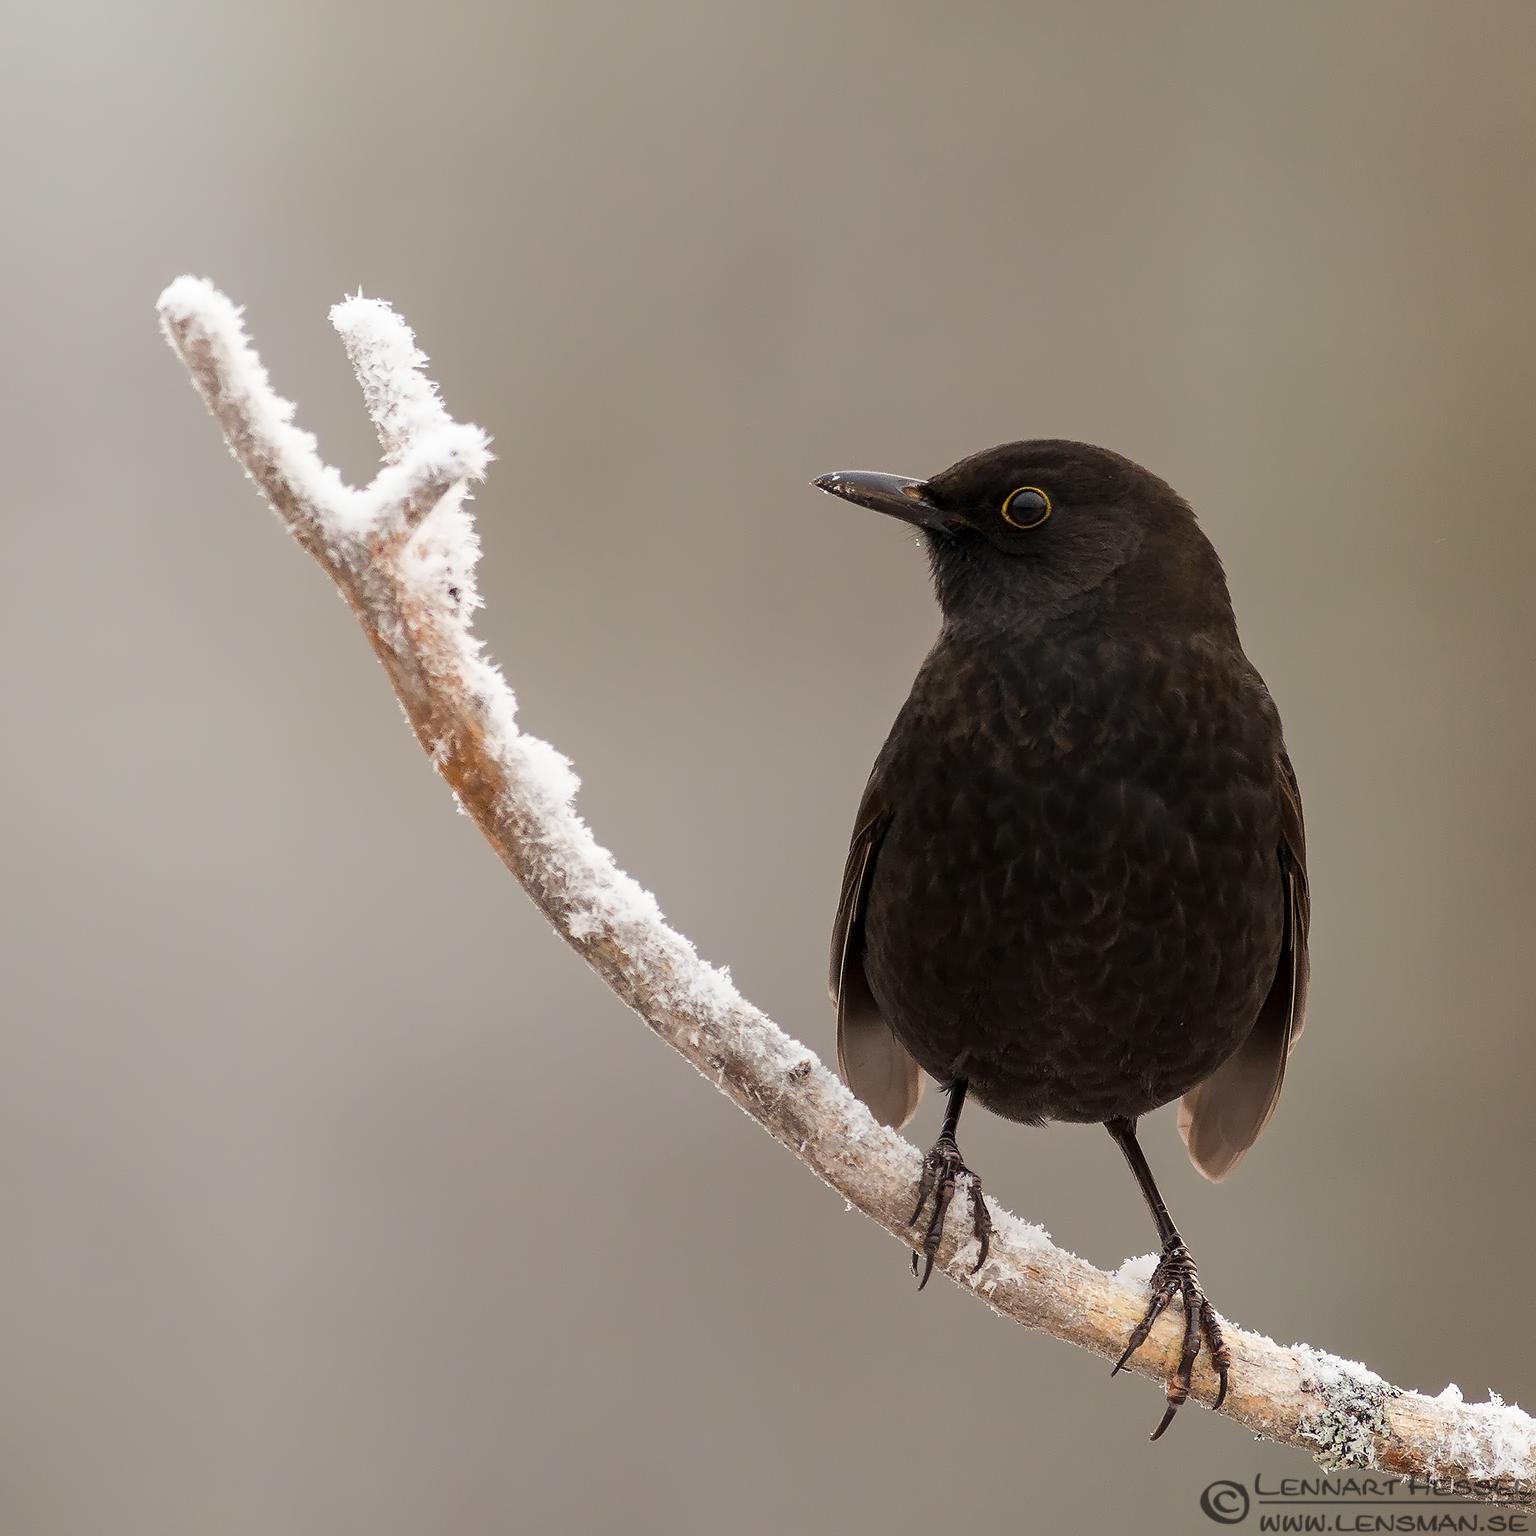 Blackbird from the Golden Eagle workshop